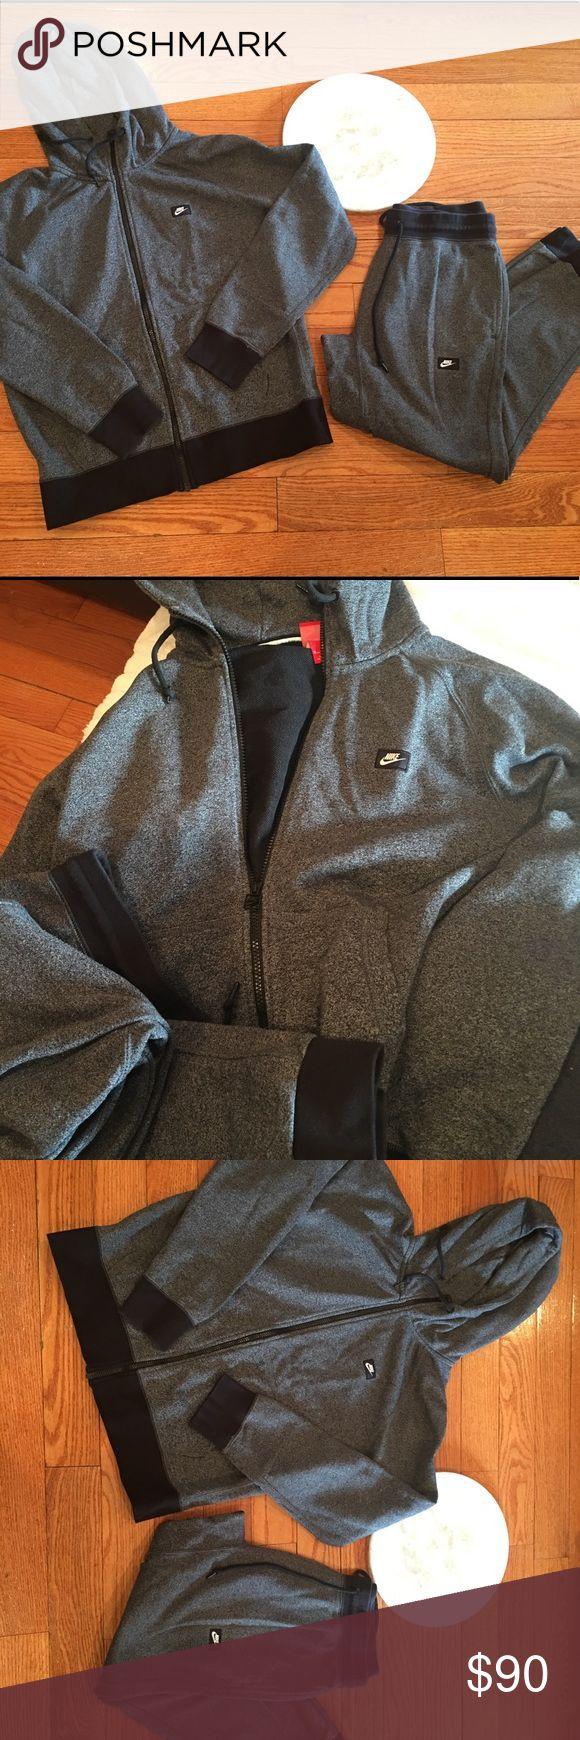 Nike jogging sweat suit set hooded skinny men Nike jogging sweat suit set hooded skinny men. Size medium Nike Jackets & Coats Performance Jackets